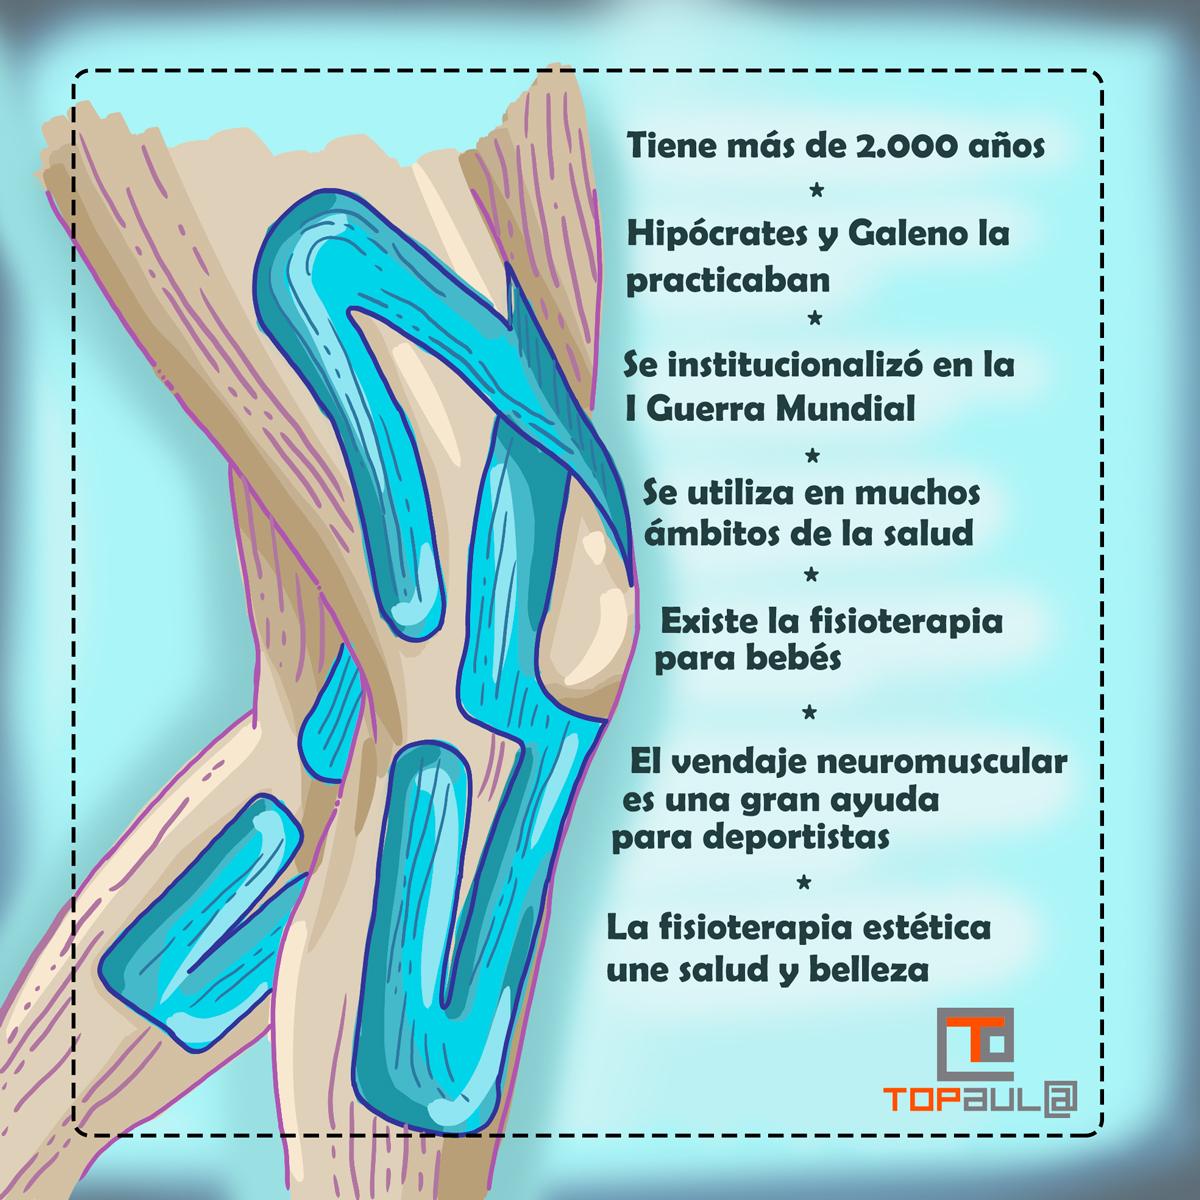 Infografía 6 curiosidades sobre la fisioterapia - www.topaula.com